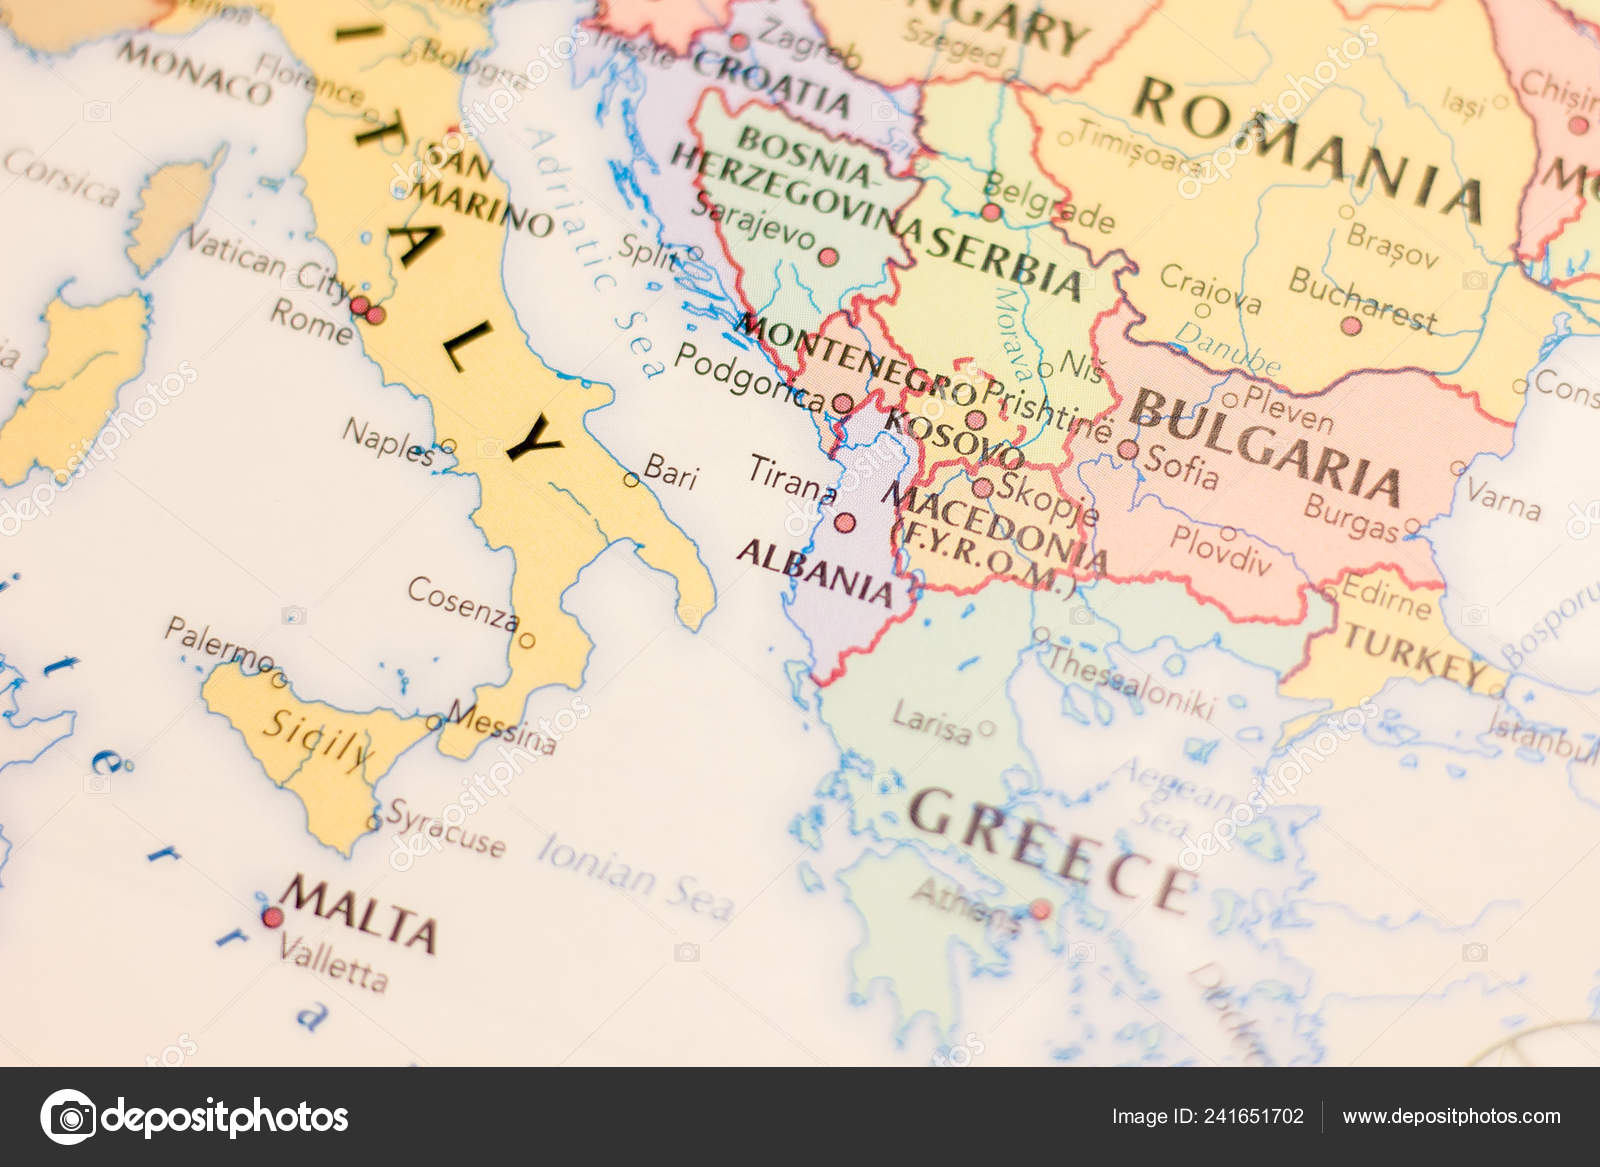 Ivanovsk Russia January 2019 Kosovo Map World — Stock Photo ... on vatican city on world map, laos on world map, syria on world map, macedonia on world map, liechtenstein on world map, the balkans on world map, kurdistan on world map, indonesia on world map, kyrgyzstan on world map, moldova on world map, montenegro on world map, mali on world map, rwanda on world map, armenia on world map, sudan on world map, aegean sea on world map, cyprus on world map, san marino on world map, ukraine on world map, albania on world map,